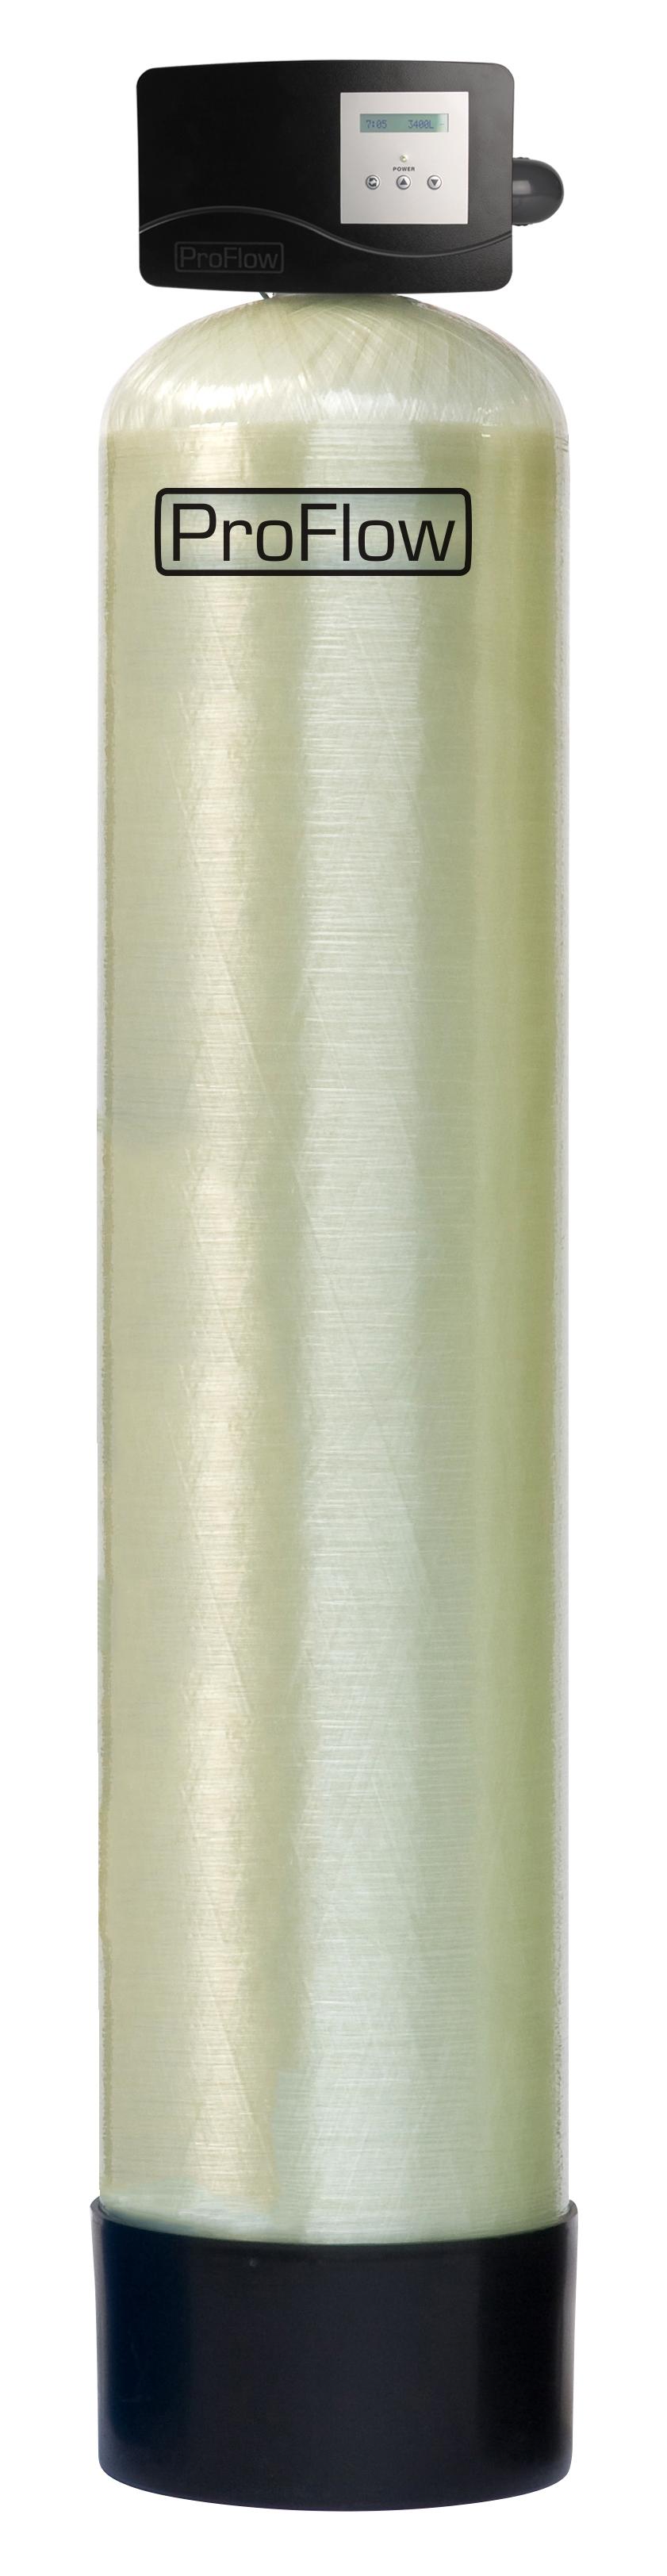 Nugeležinimo filtras PF-OXY1,5 3